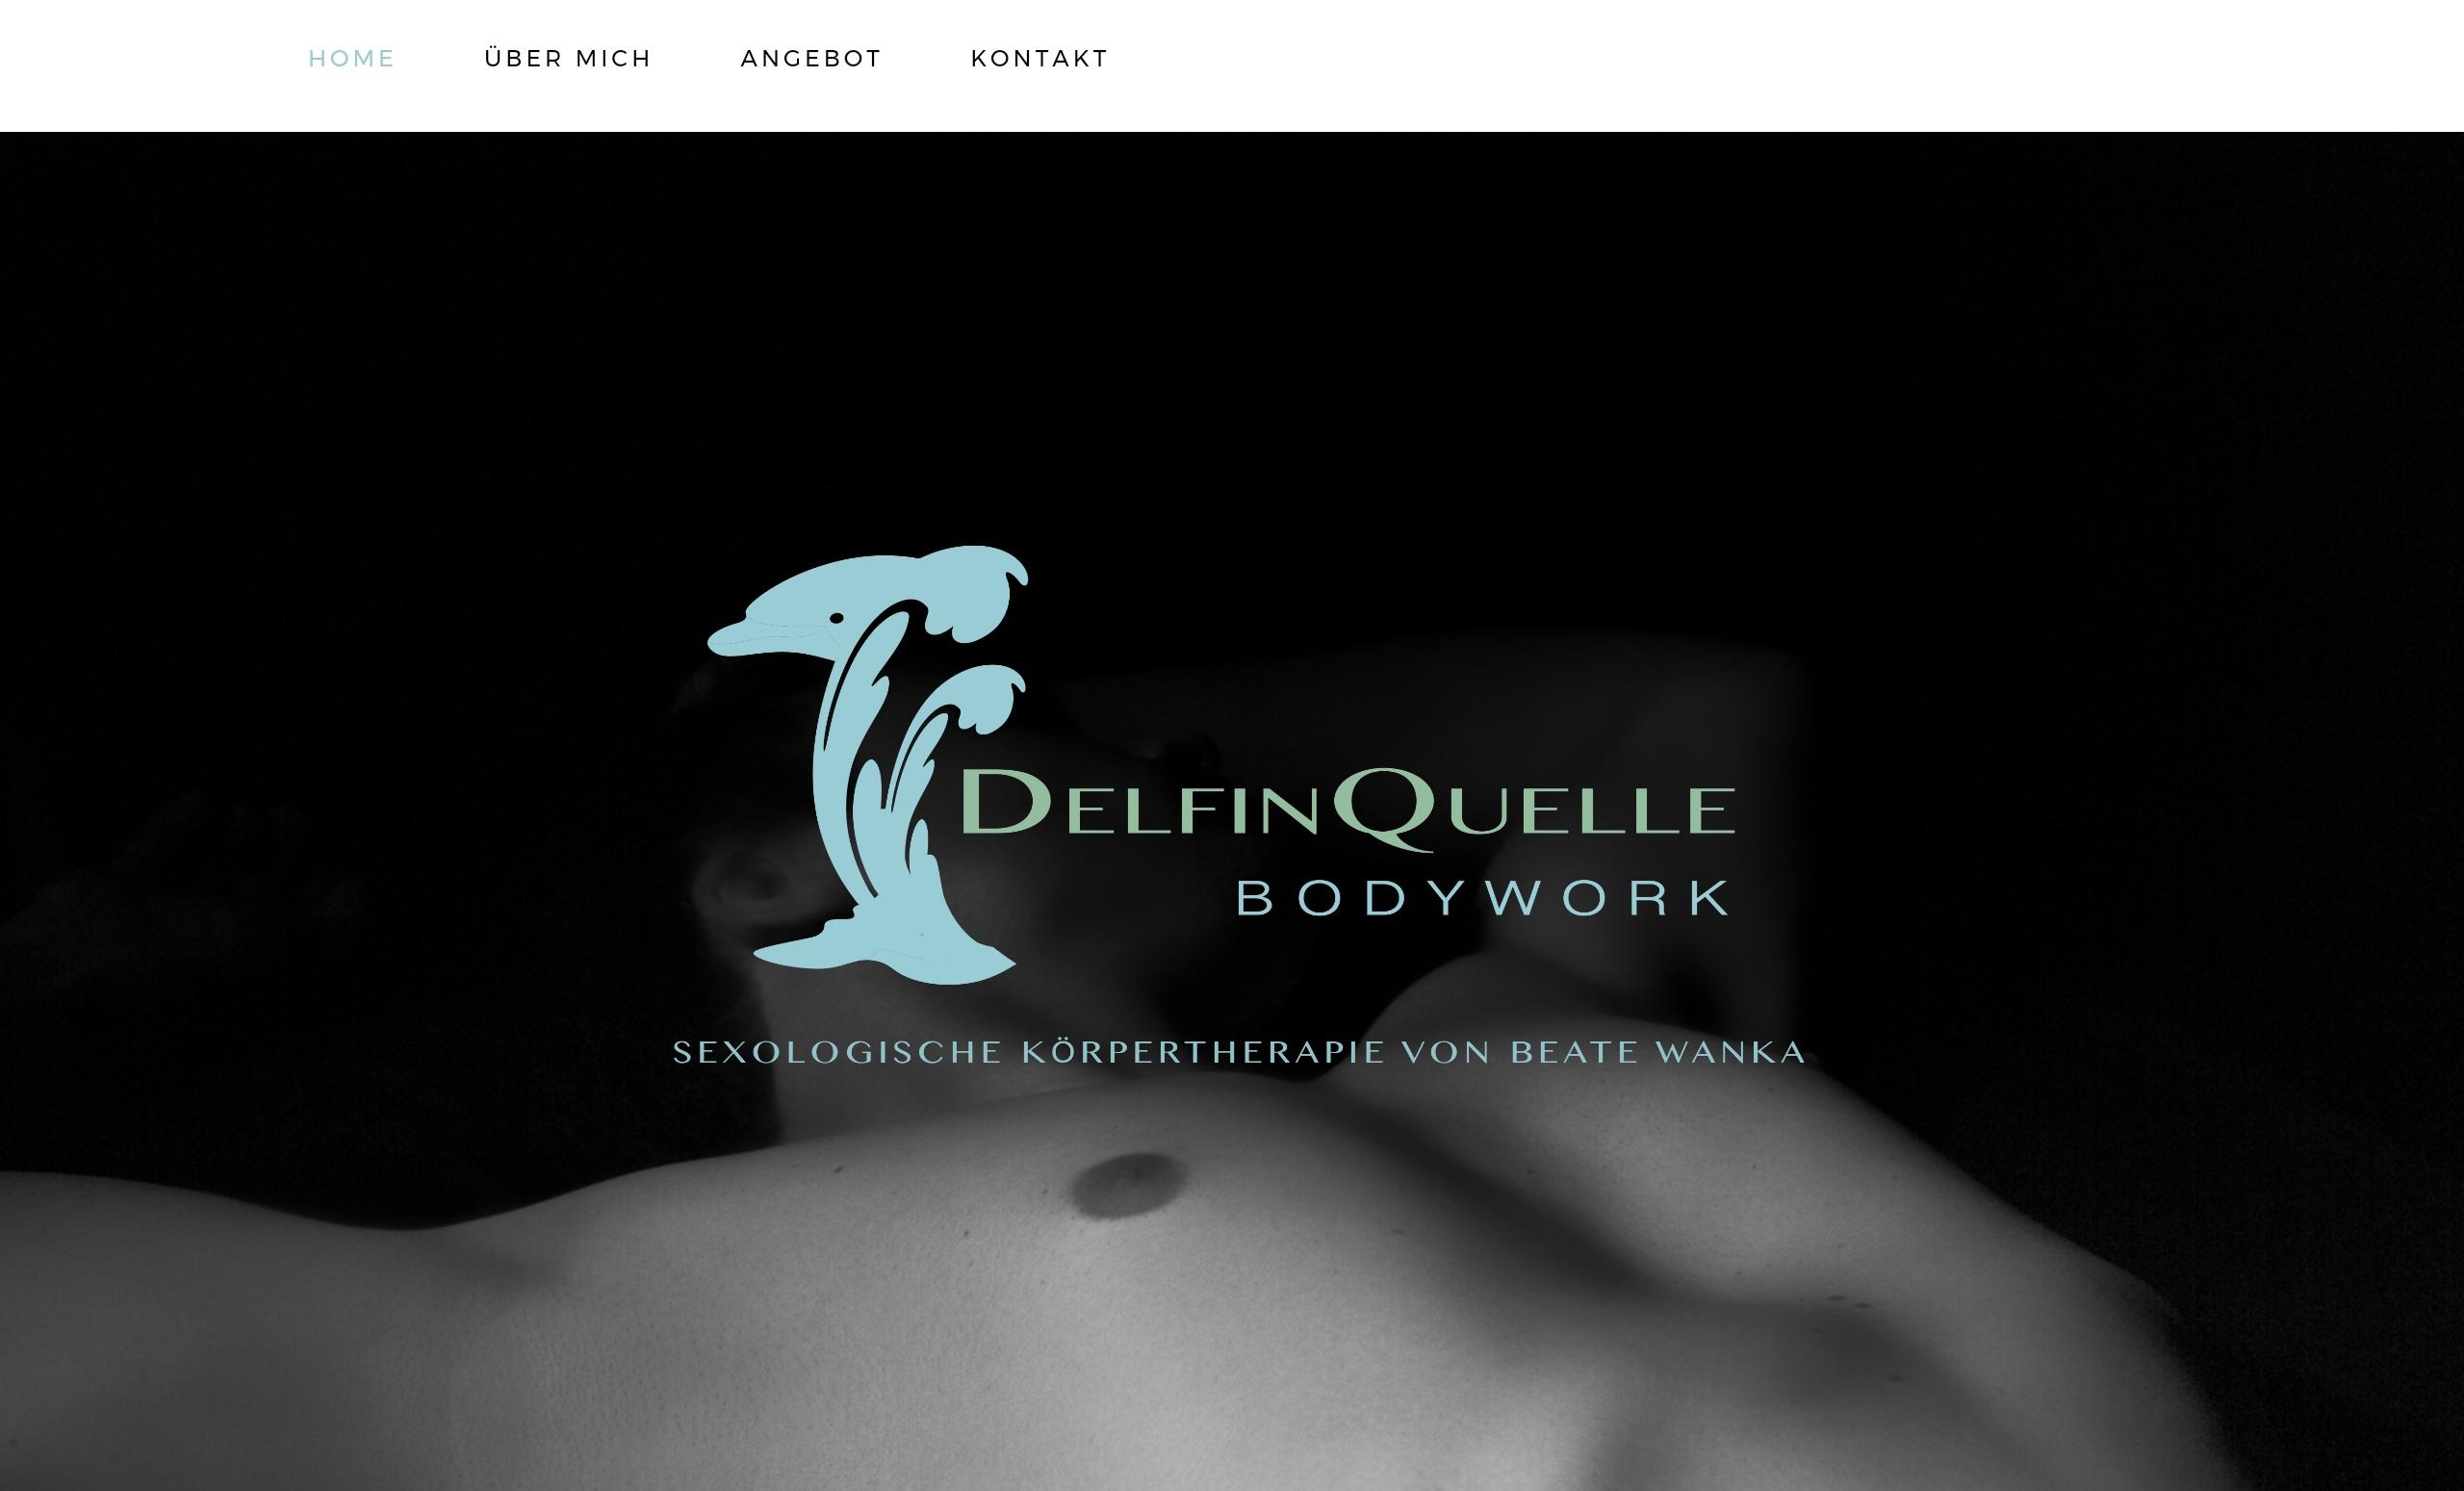 Delfinquelle Bodywork Website from Social52.ch